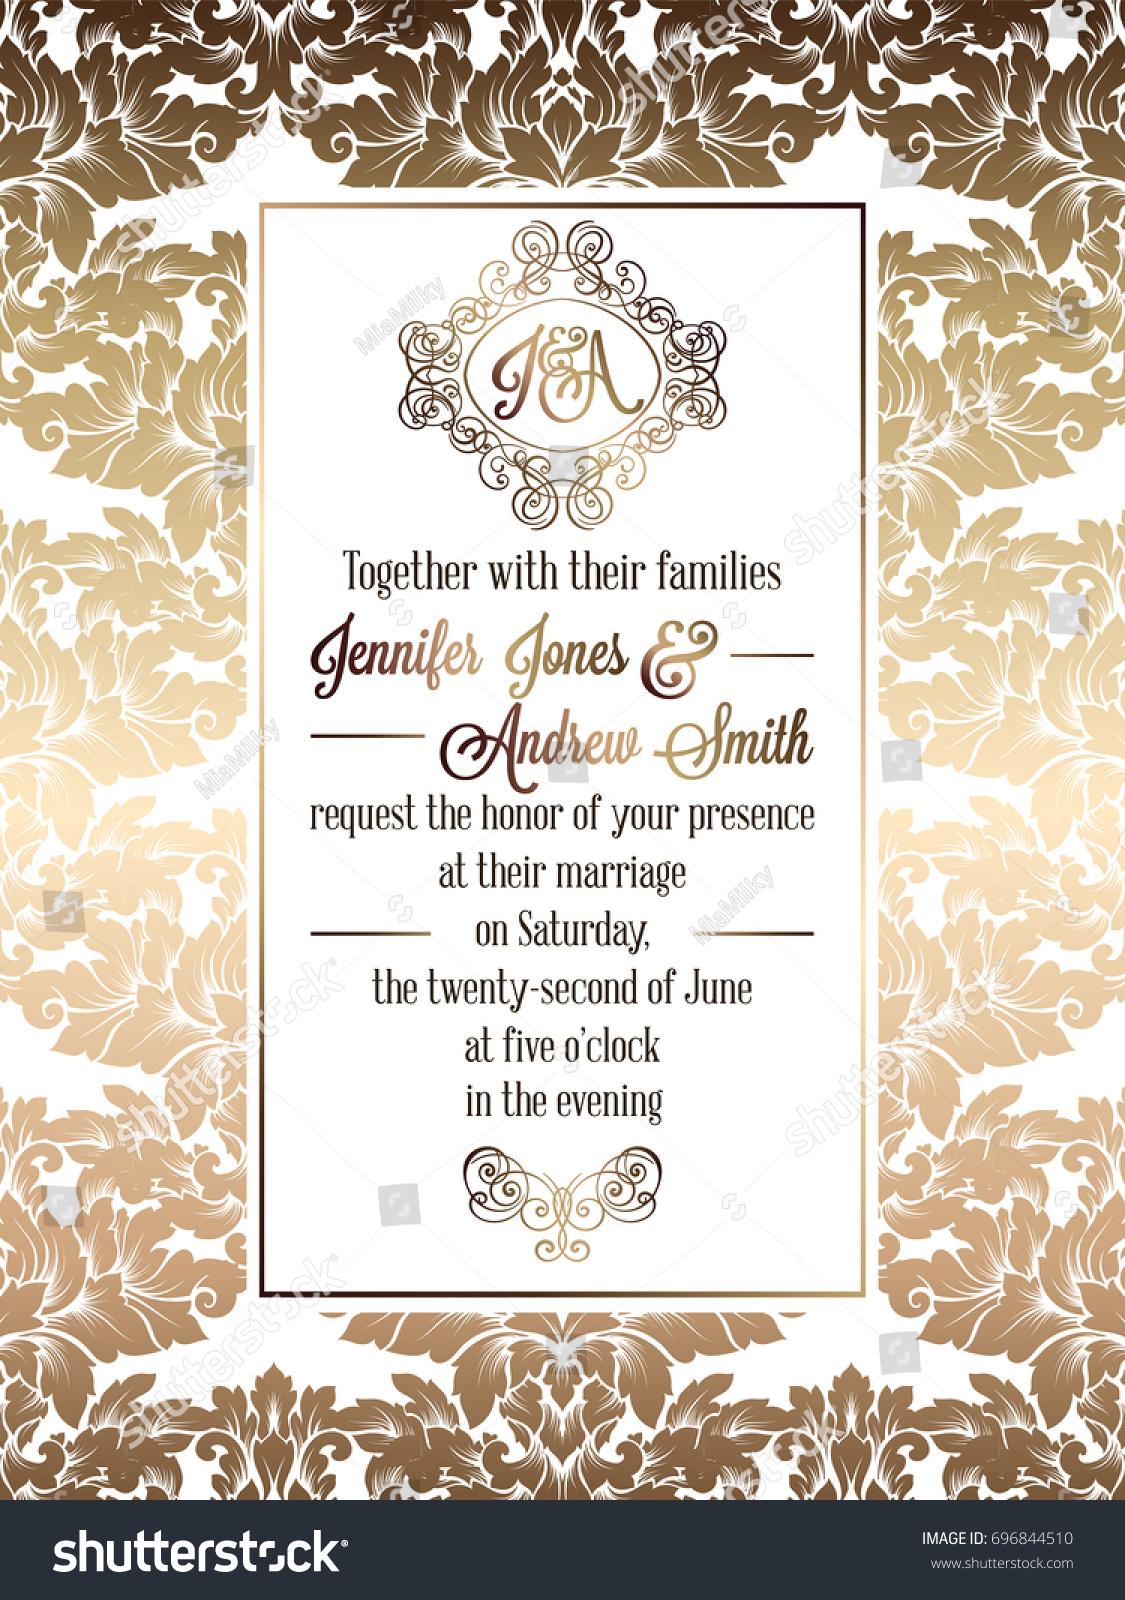 Vintage baroque style wedding invitation card stock illustration vintage baroque style wedding invitation card template elegant formal design with damask background stopboris Choice Image